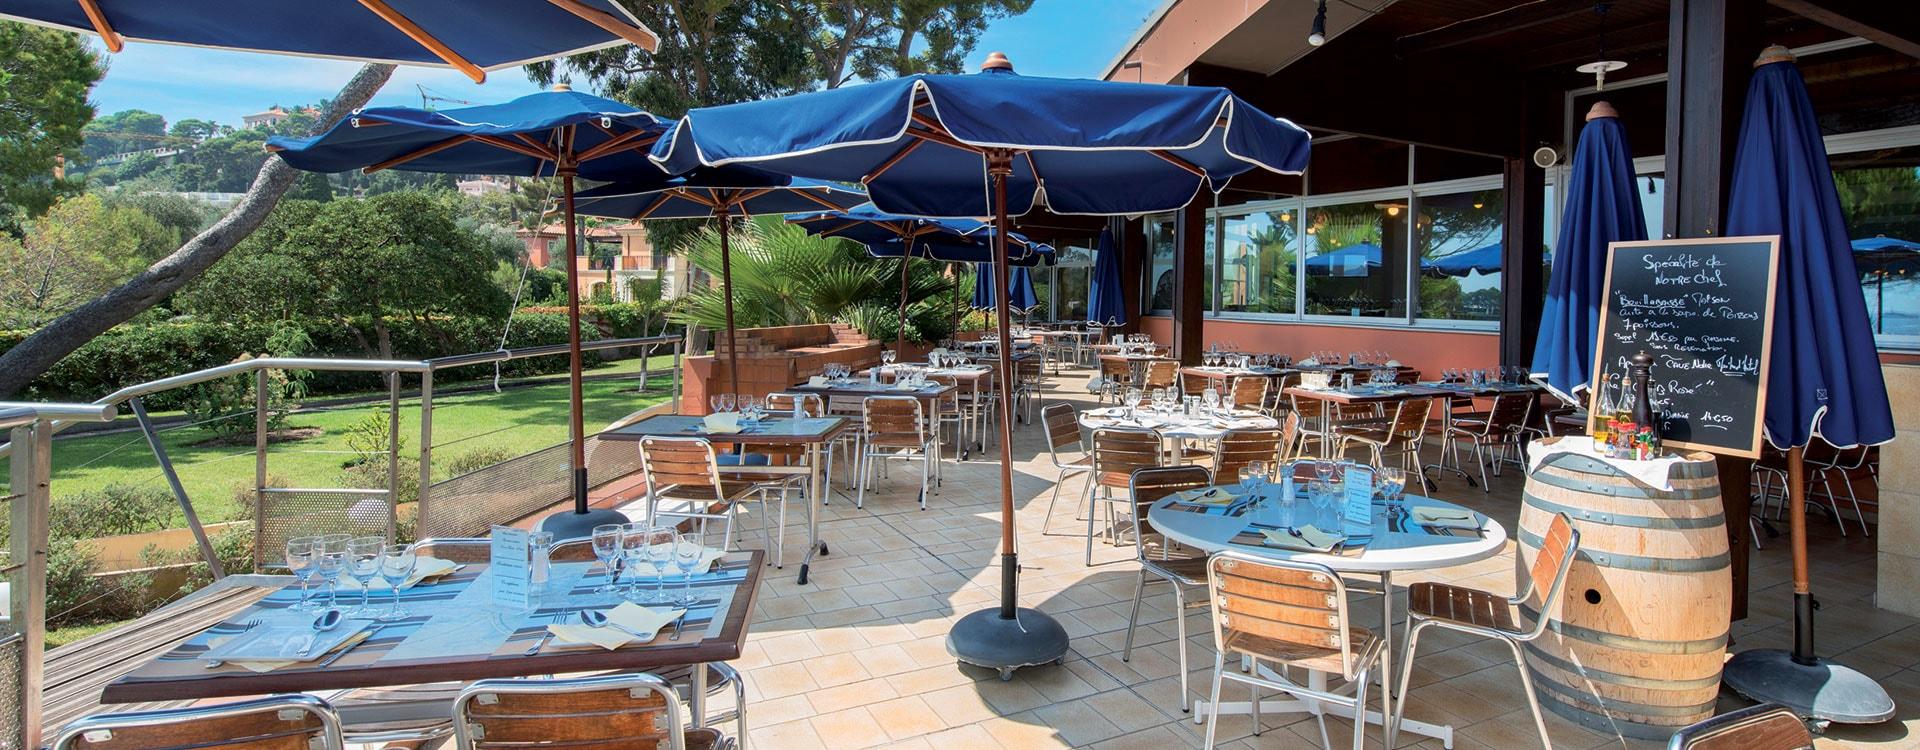 Hotel Restaurant Delcloy